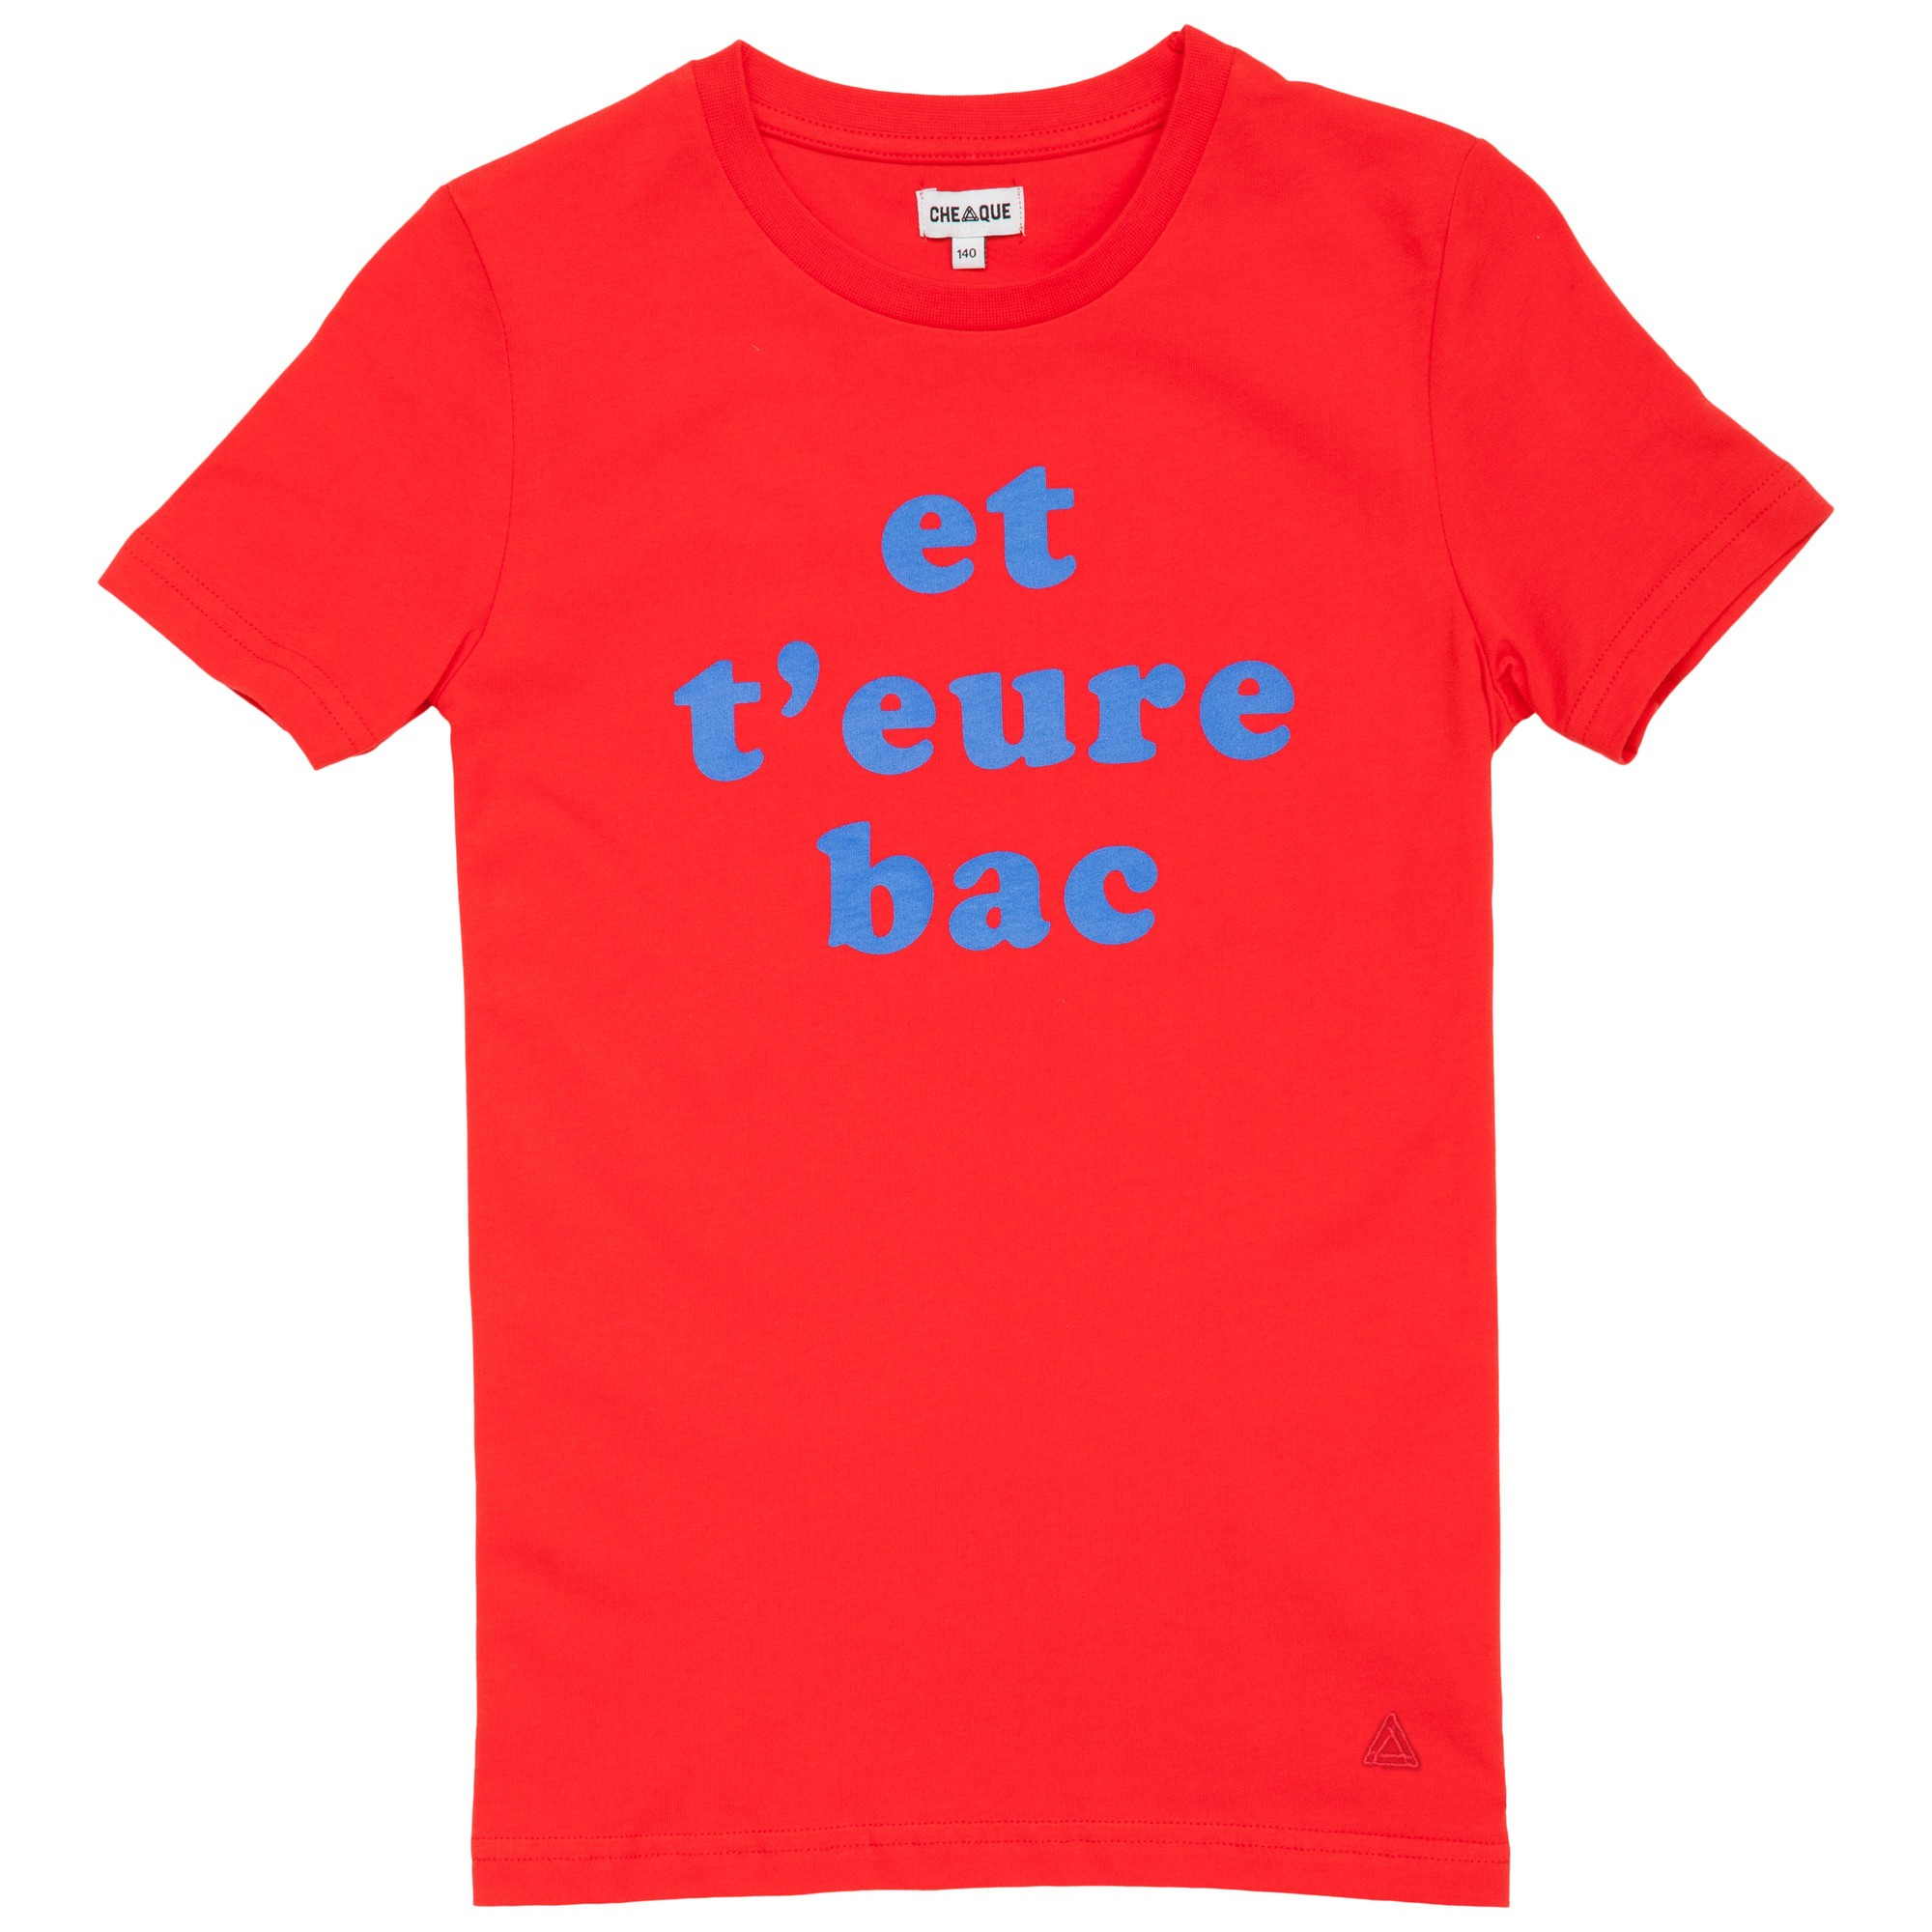 Afbeelding van Cheaque Et T'eure Bac Shirt Junior Red